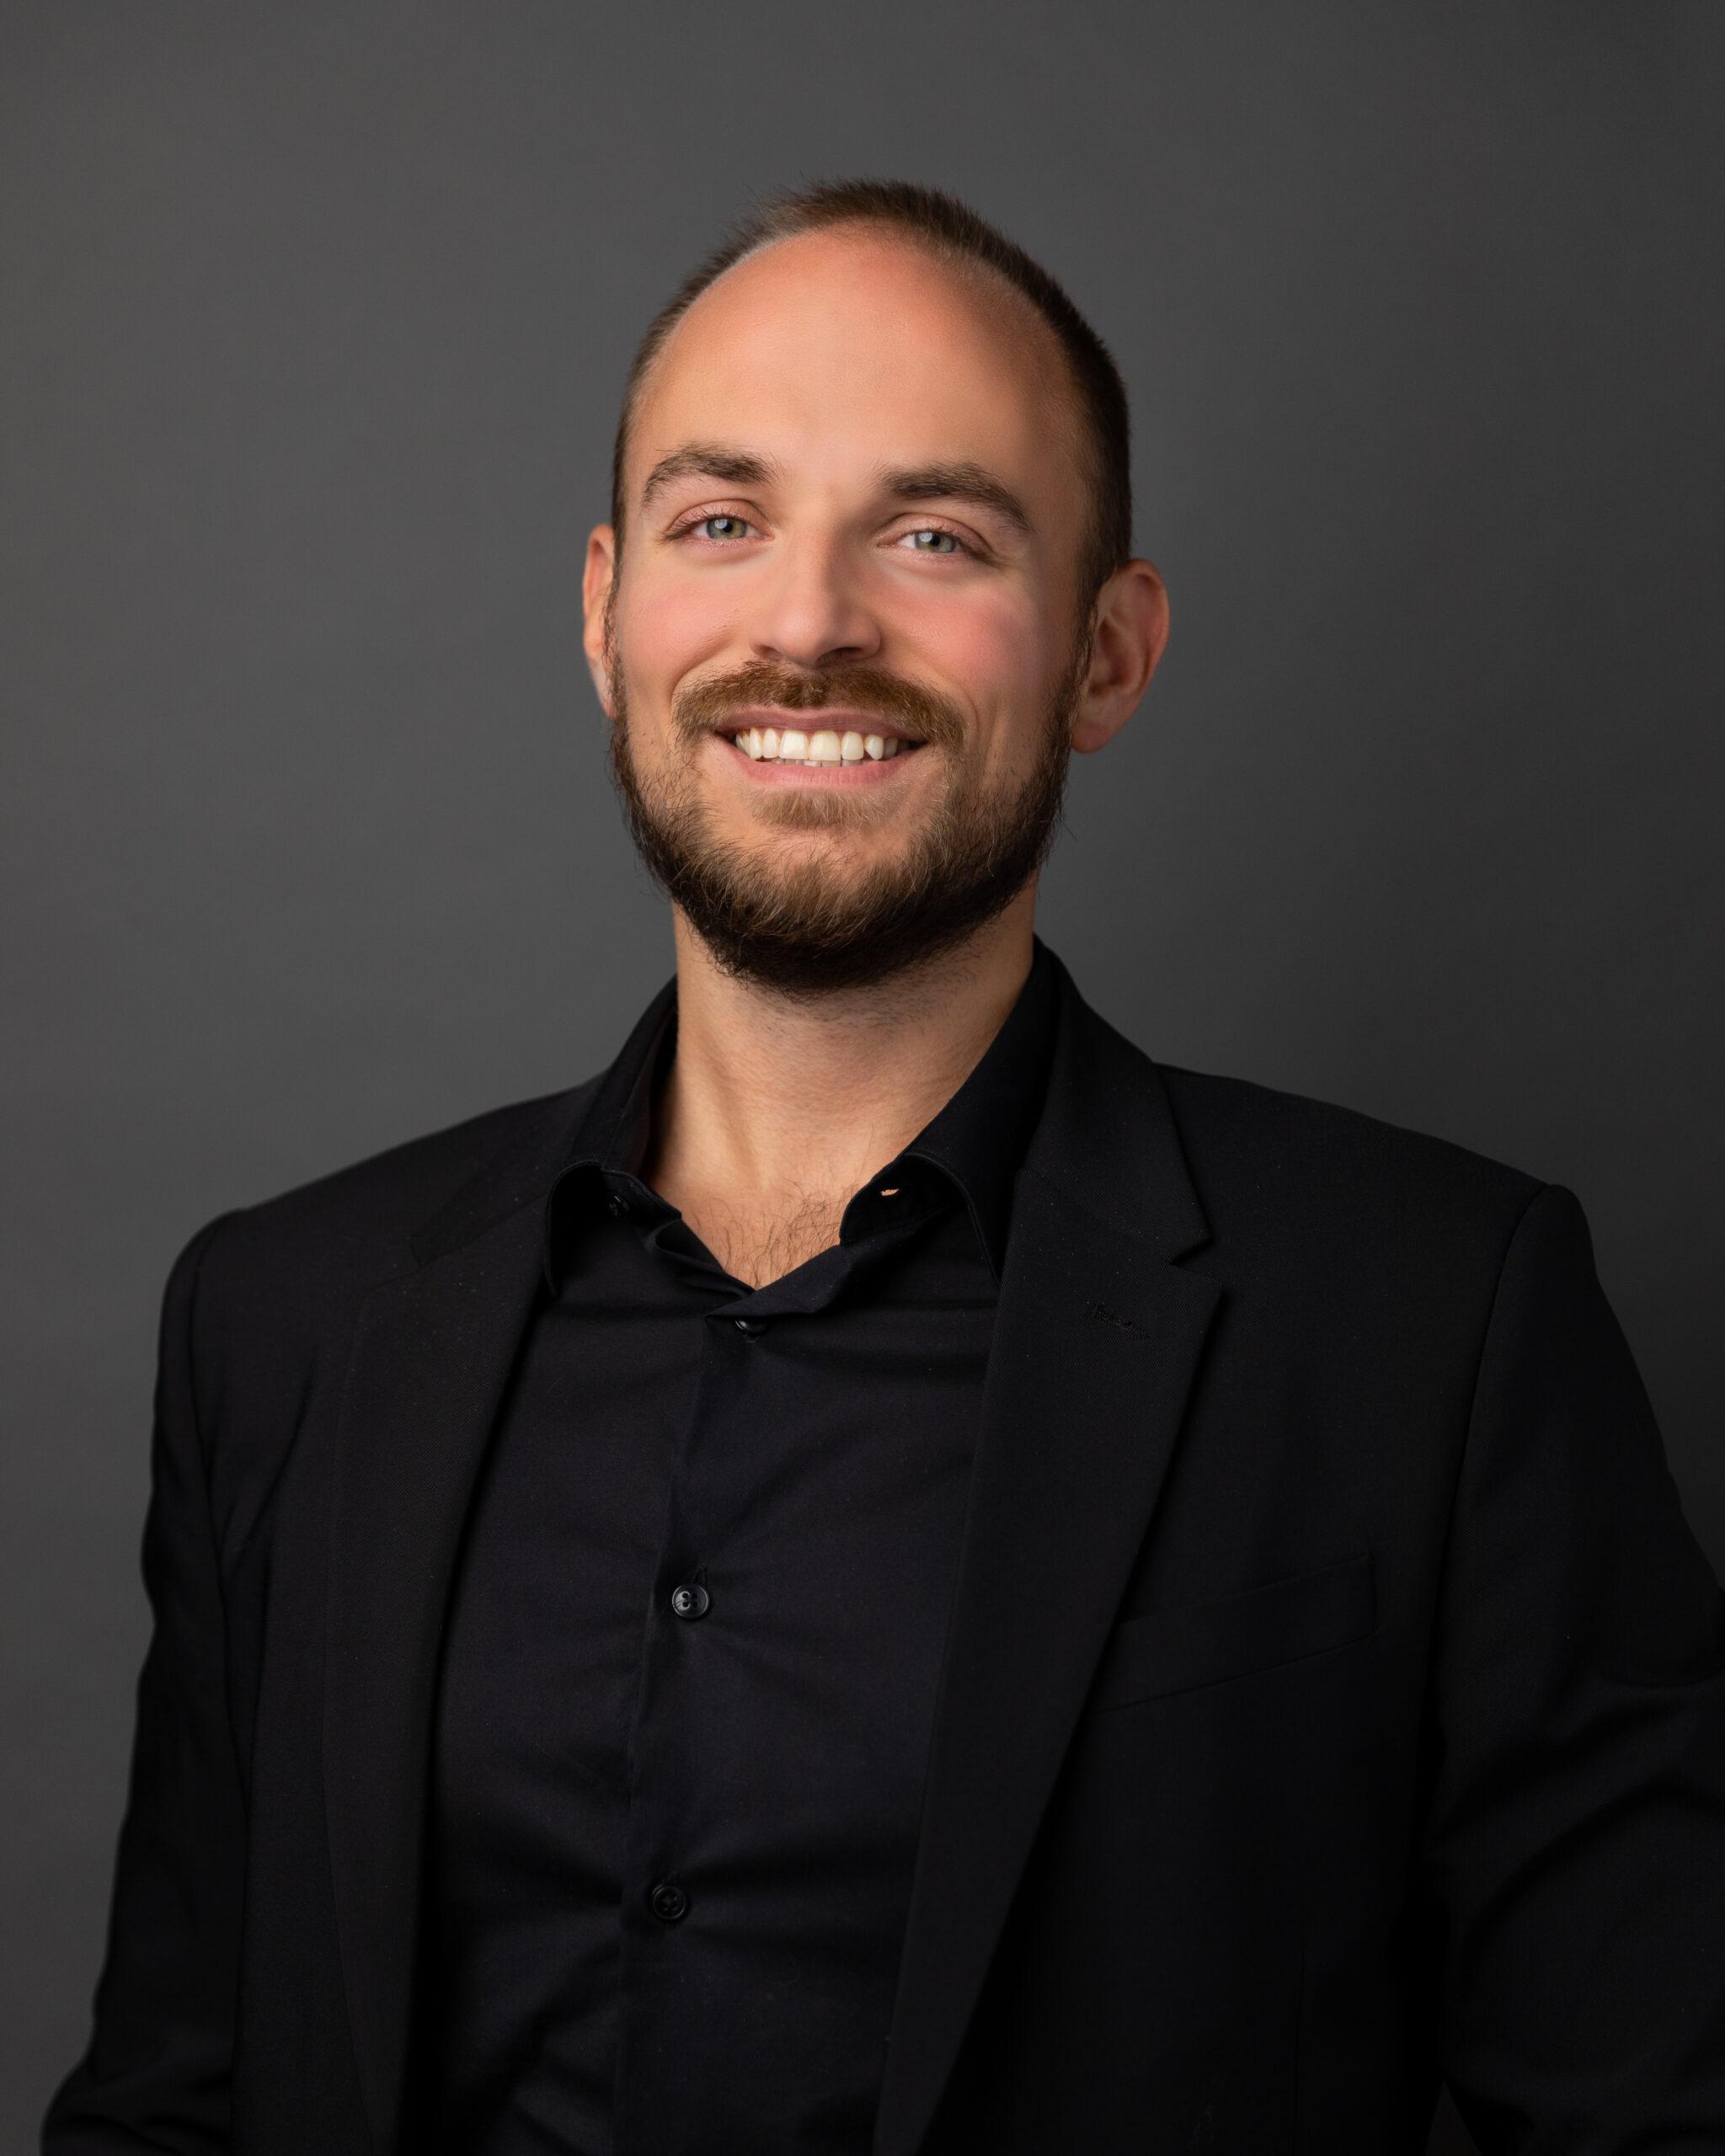 Adam Pierzecki